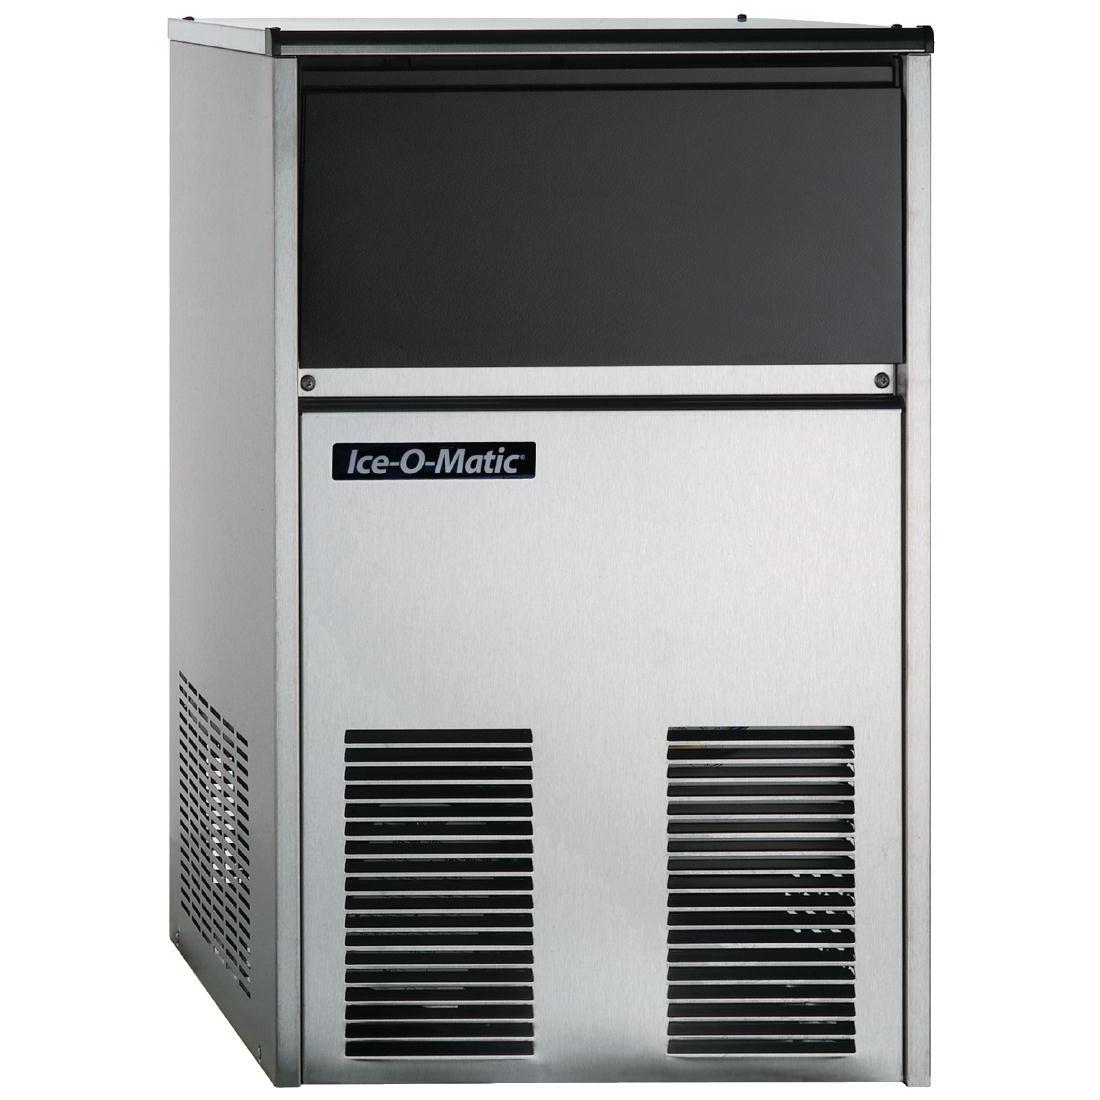 ice o matic mains fill ice machine 38kg output iceu66 - Ice O Matic Ice Machine